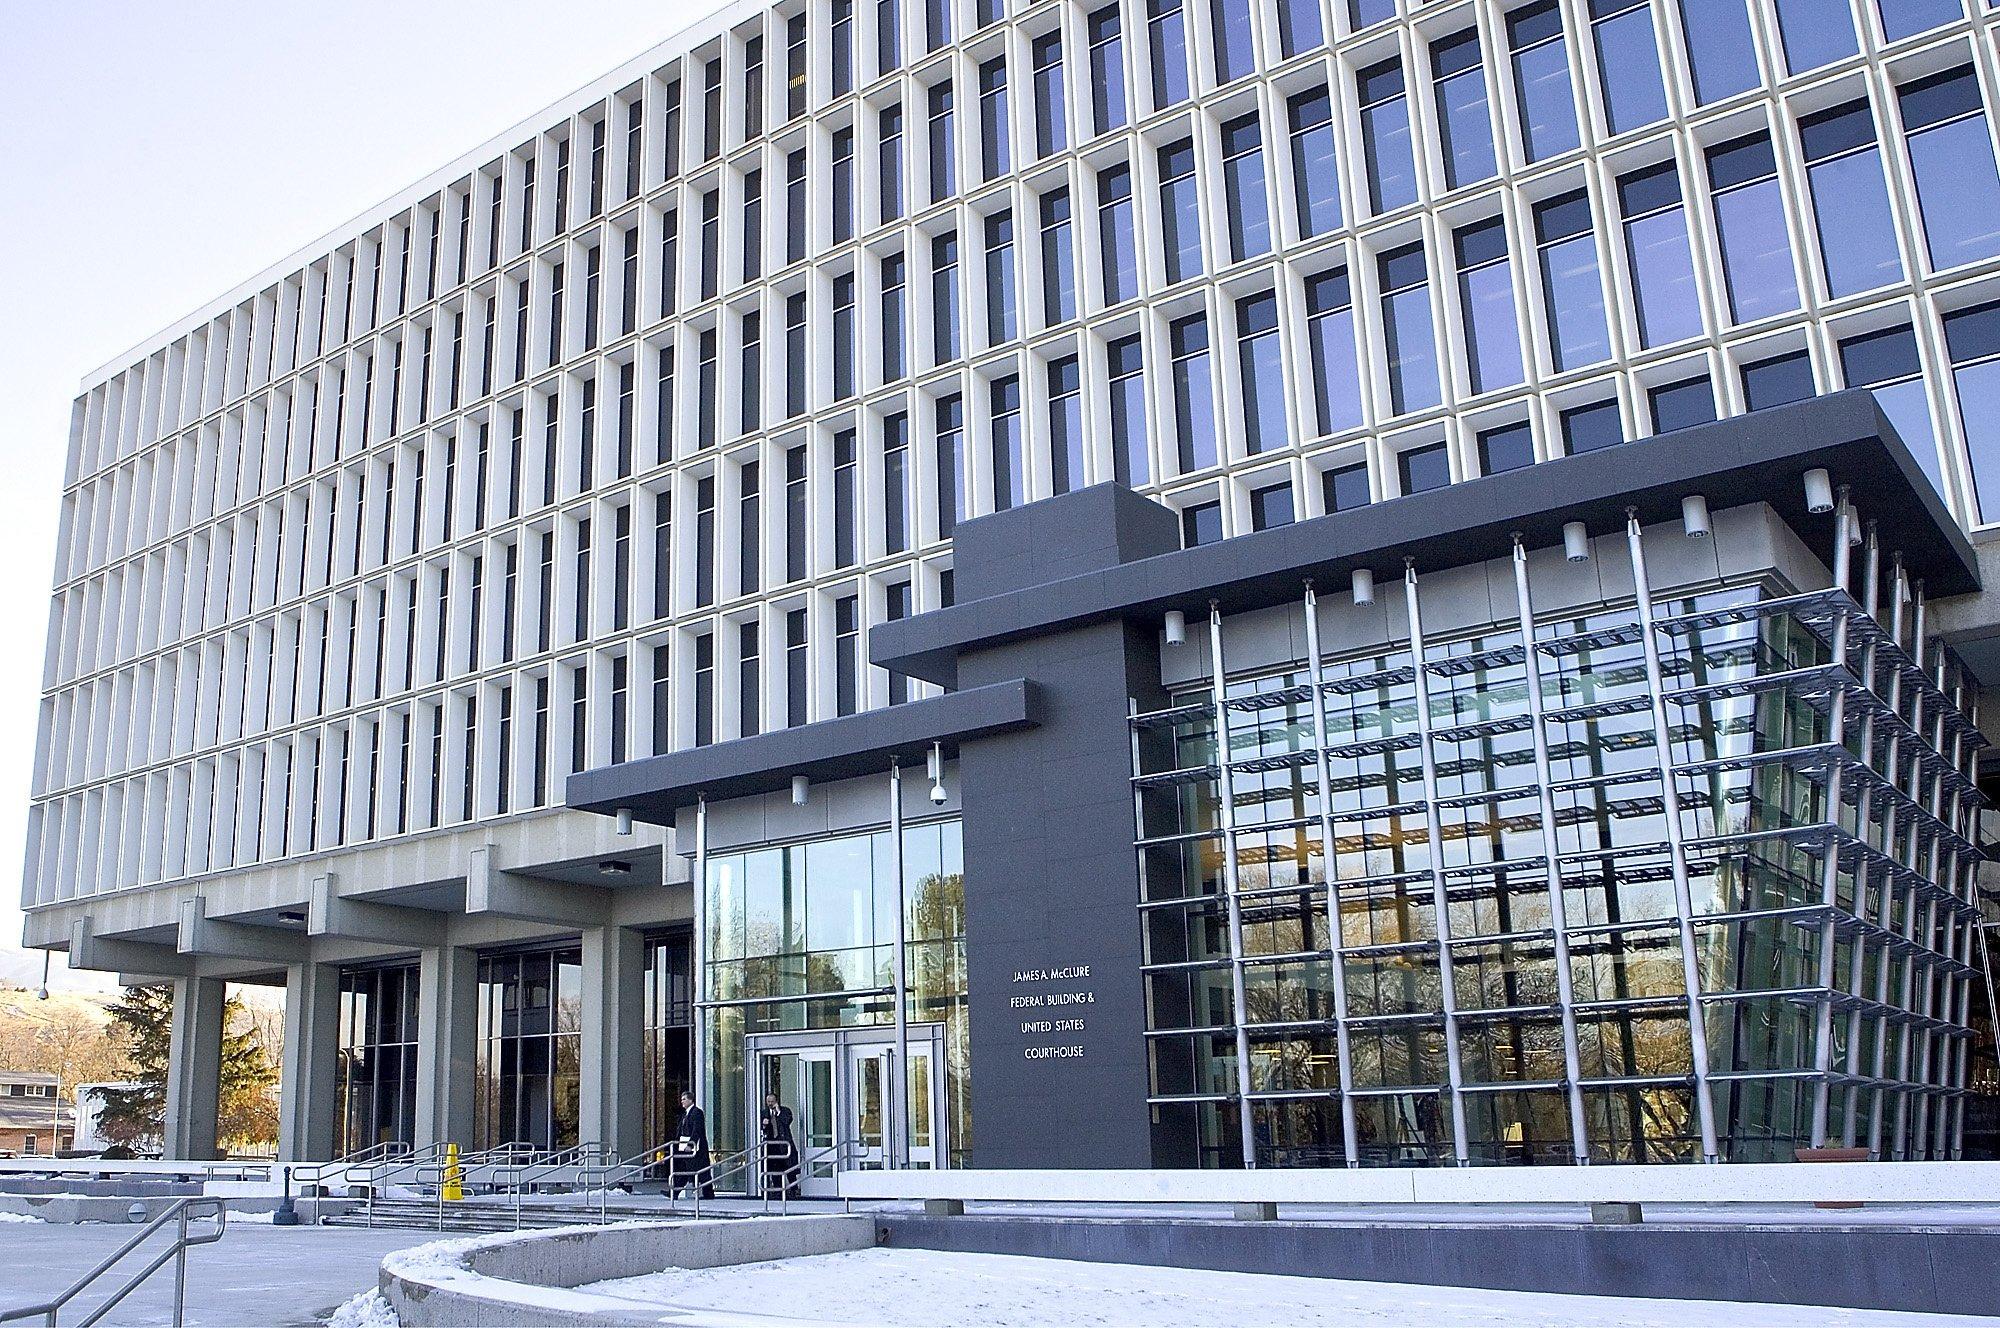 Judge Idaho Must Allow Gender Changes On Birth Certificates